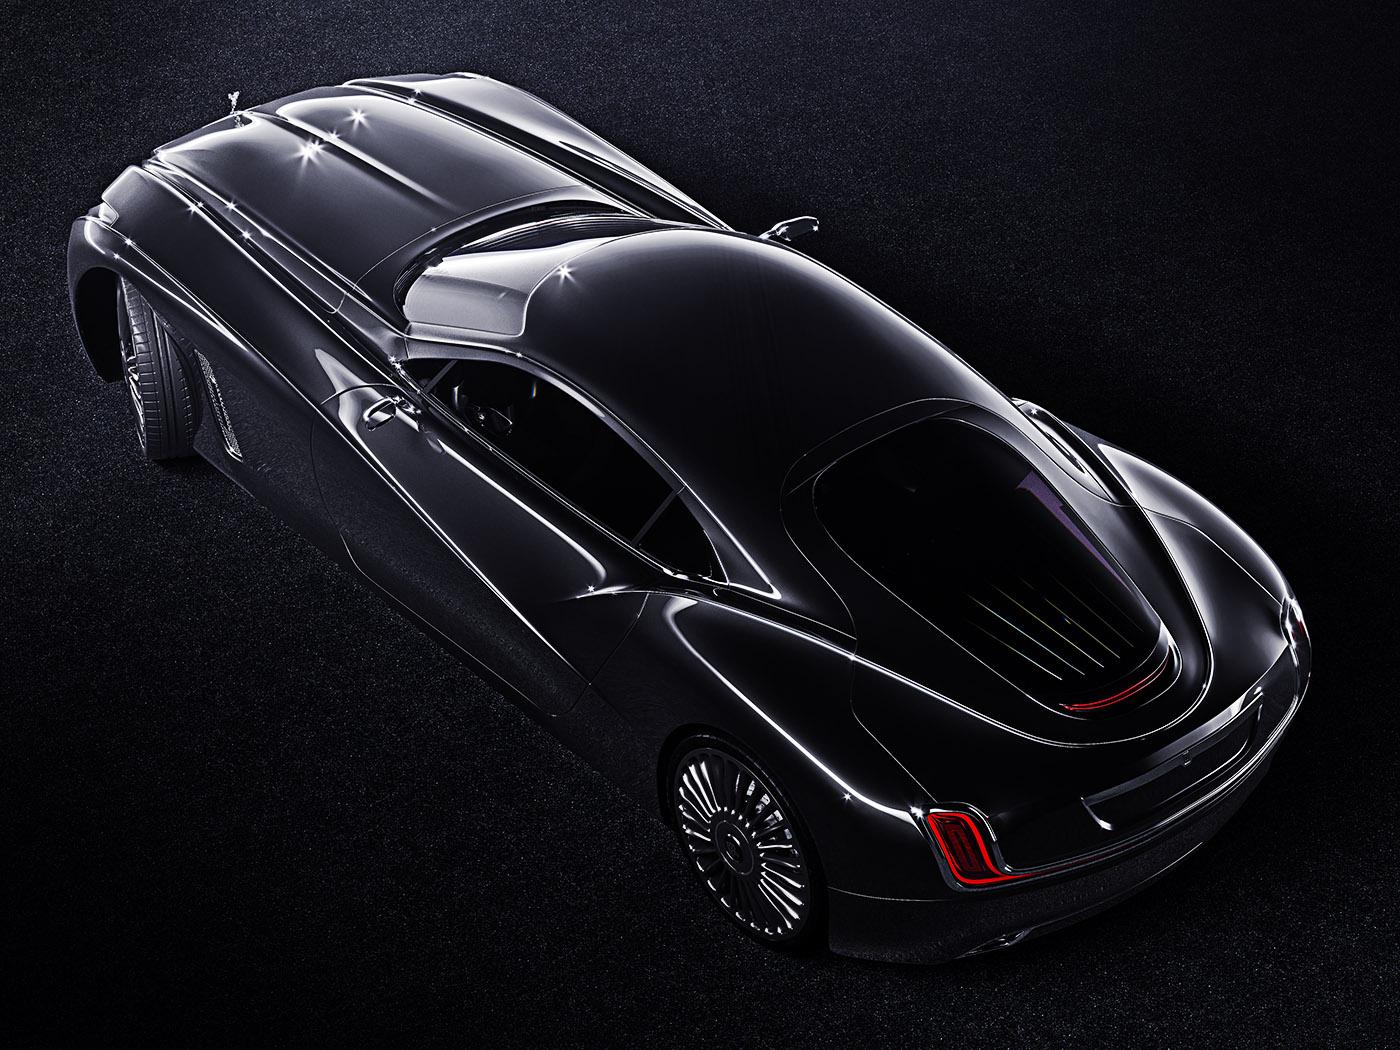 Rolls Royce luxury automotive design 9.jpg